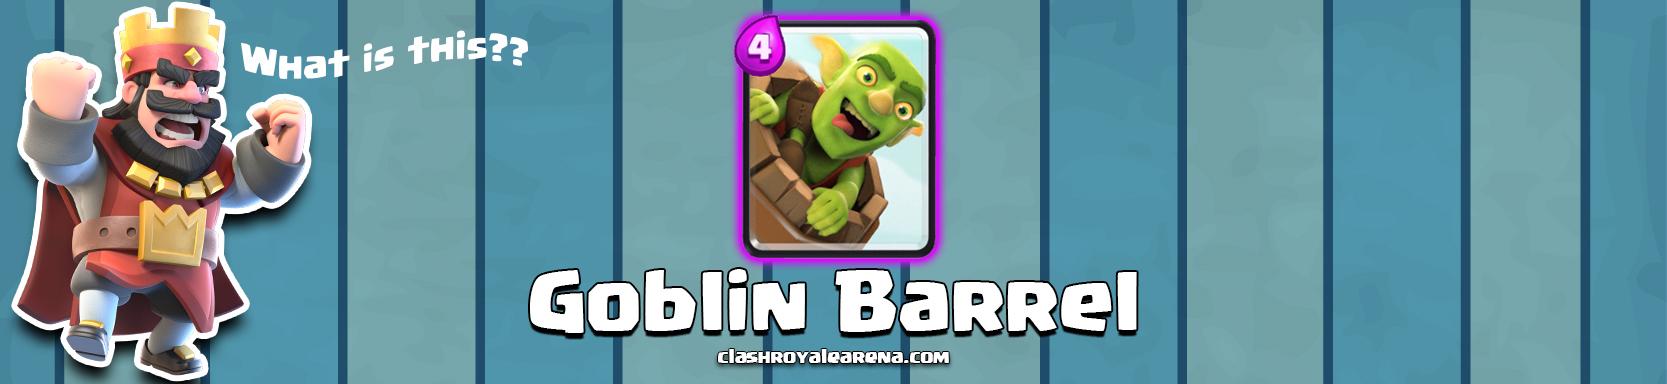 Goblin Barrel Clash Royale